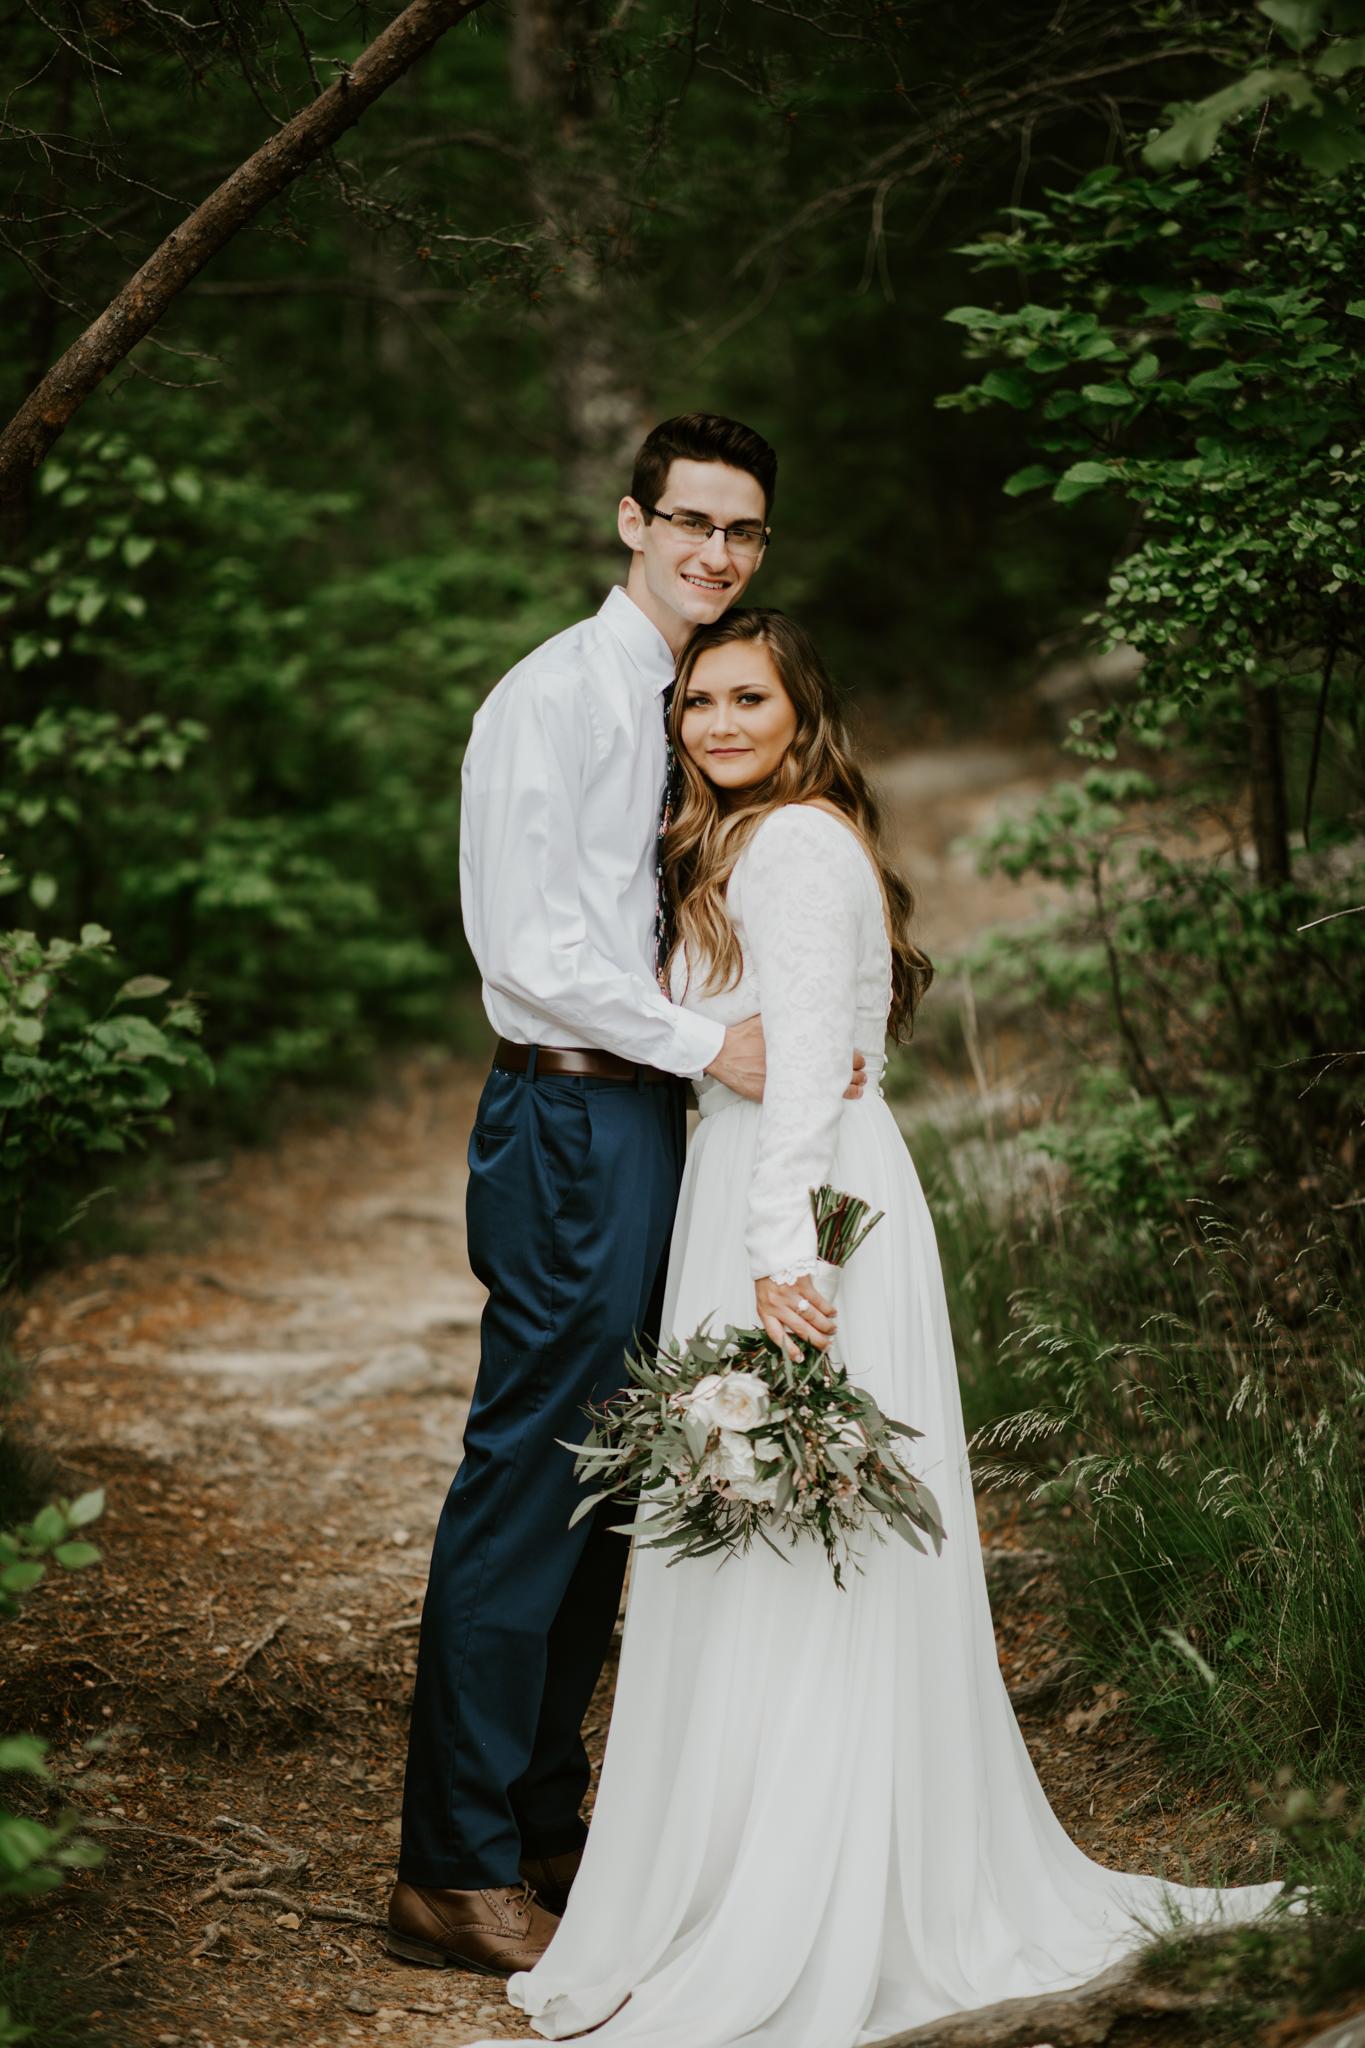 Lacey-Joe-Chattanooga-Nashville-Tennessee-Wedding-Elopement-Photographer-136.jpg